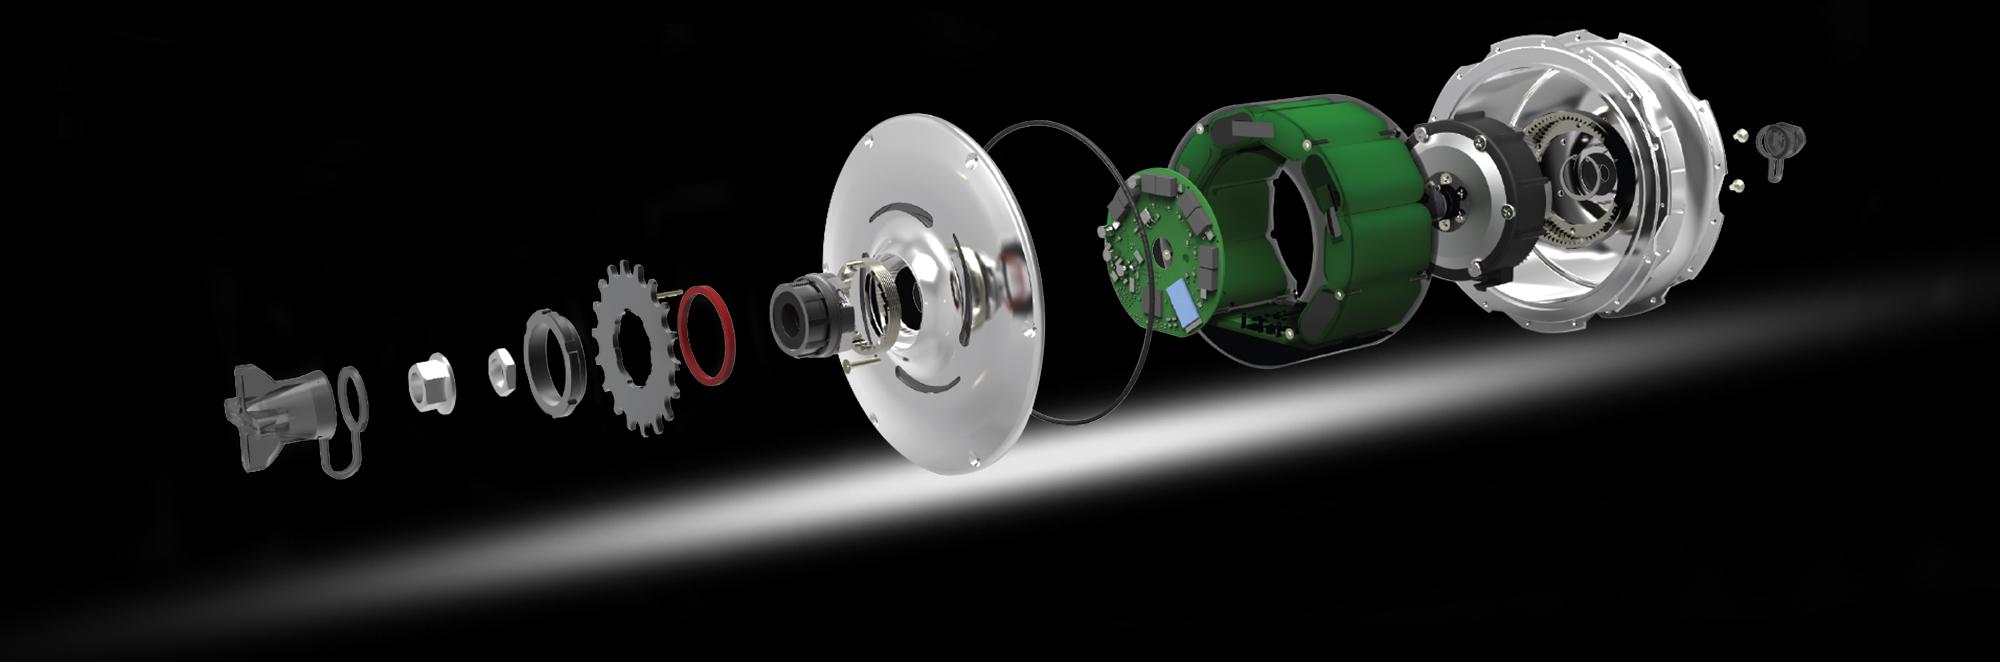 Componenti motore Zehus per la bici elettrica leggera OLYMPUS